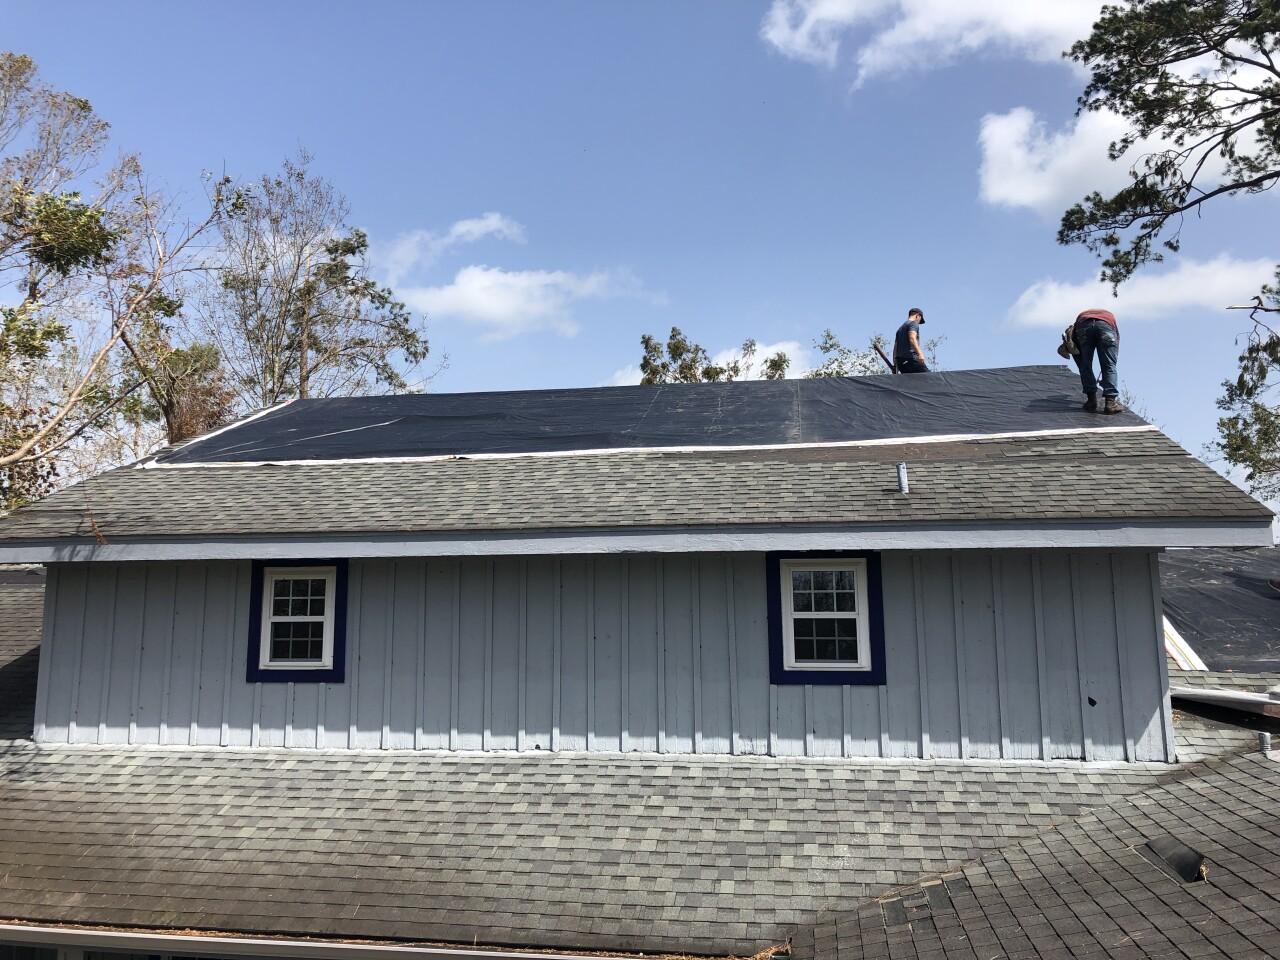 Uber Freight roof tarps